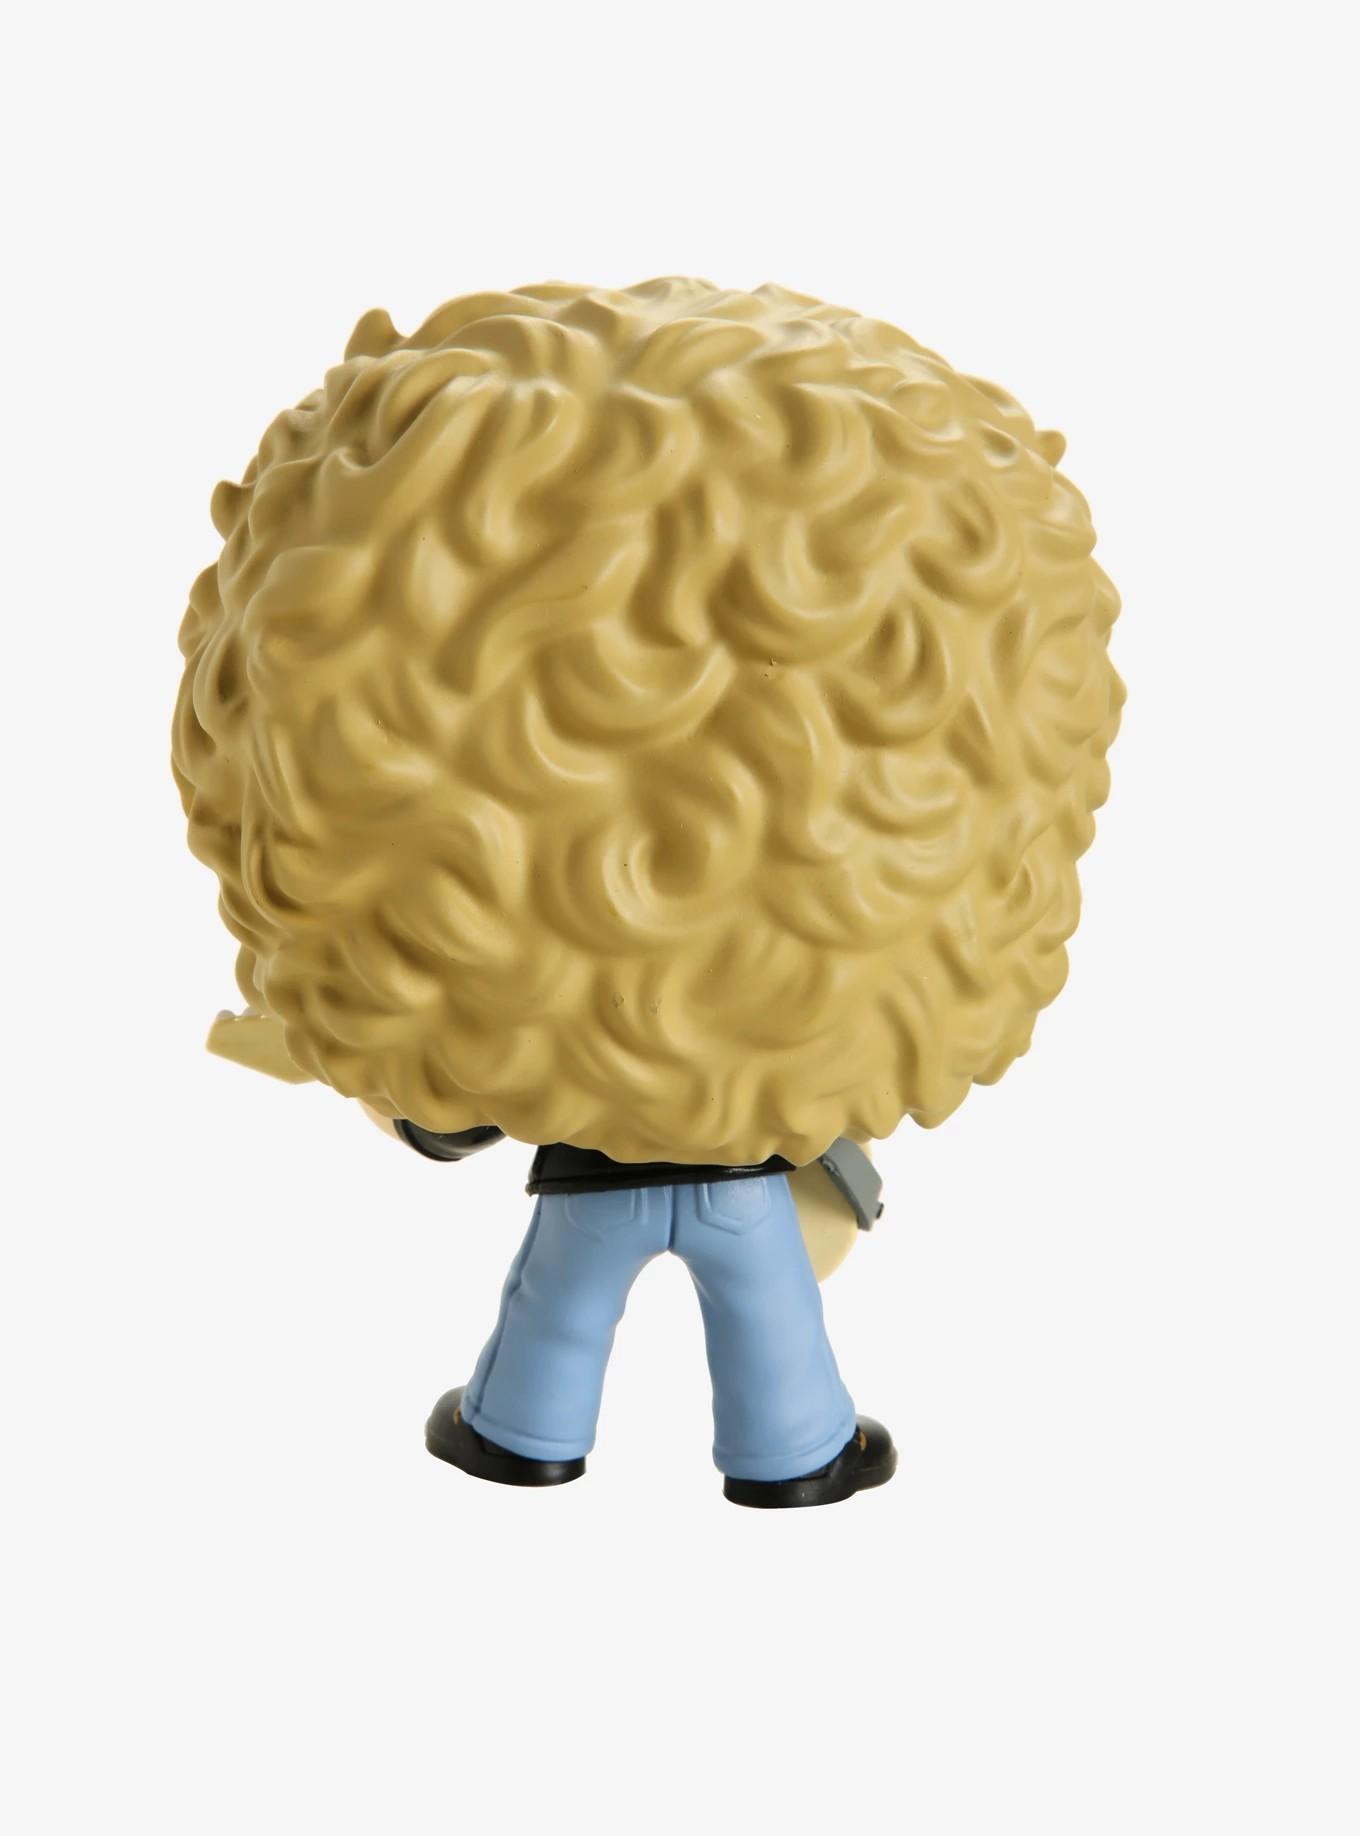 Def Leppard - Funko Pop! Rocks